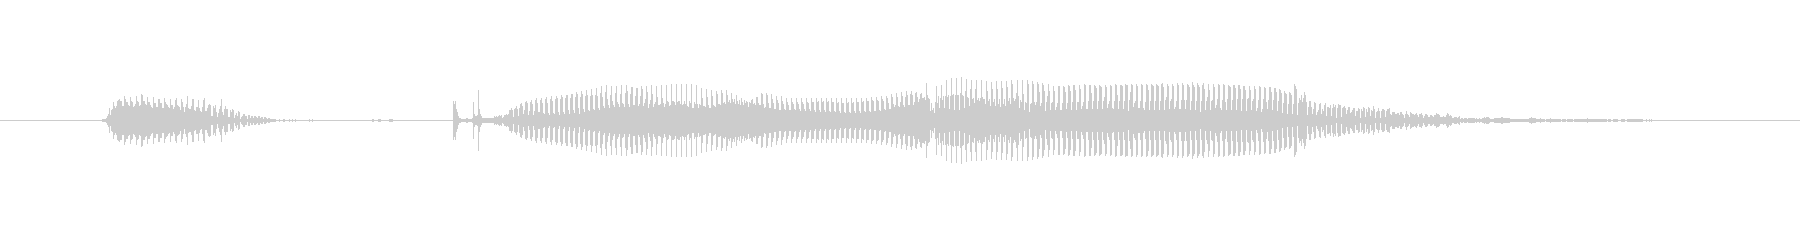 「OK-La」子供(シングリッシュ)の未再生の波形